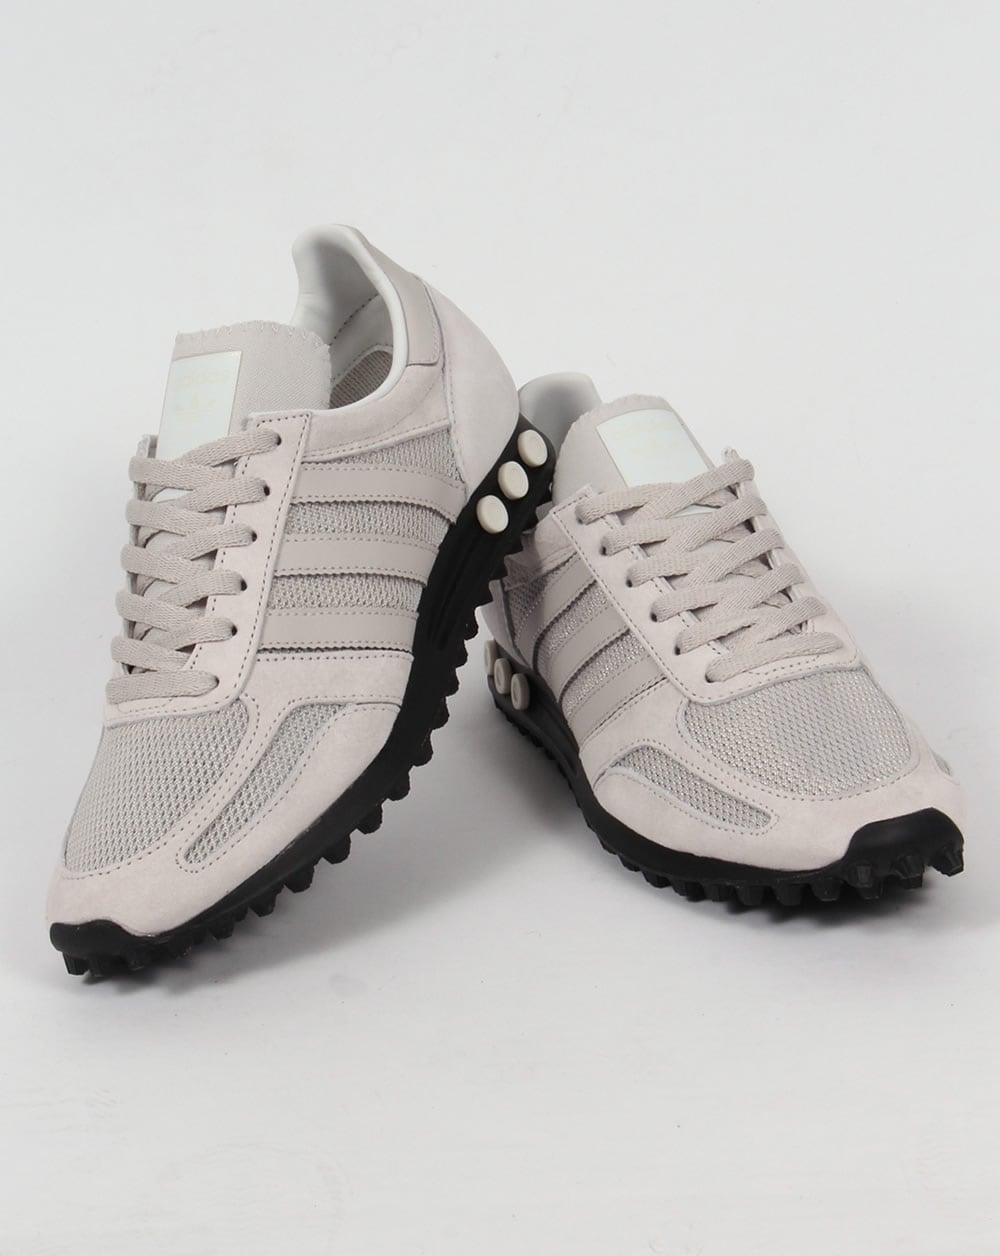 Adidas LA Trainer OG Pearl Grey